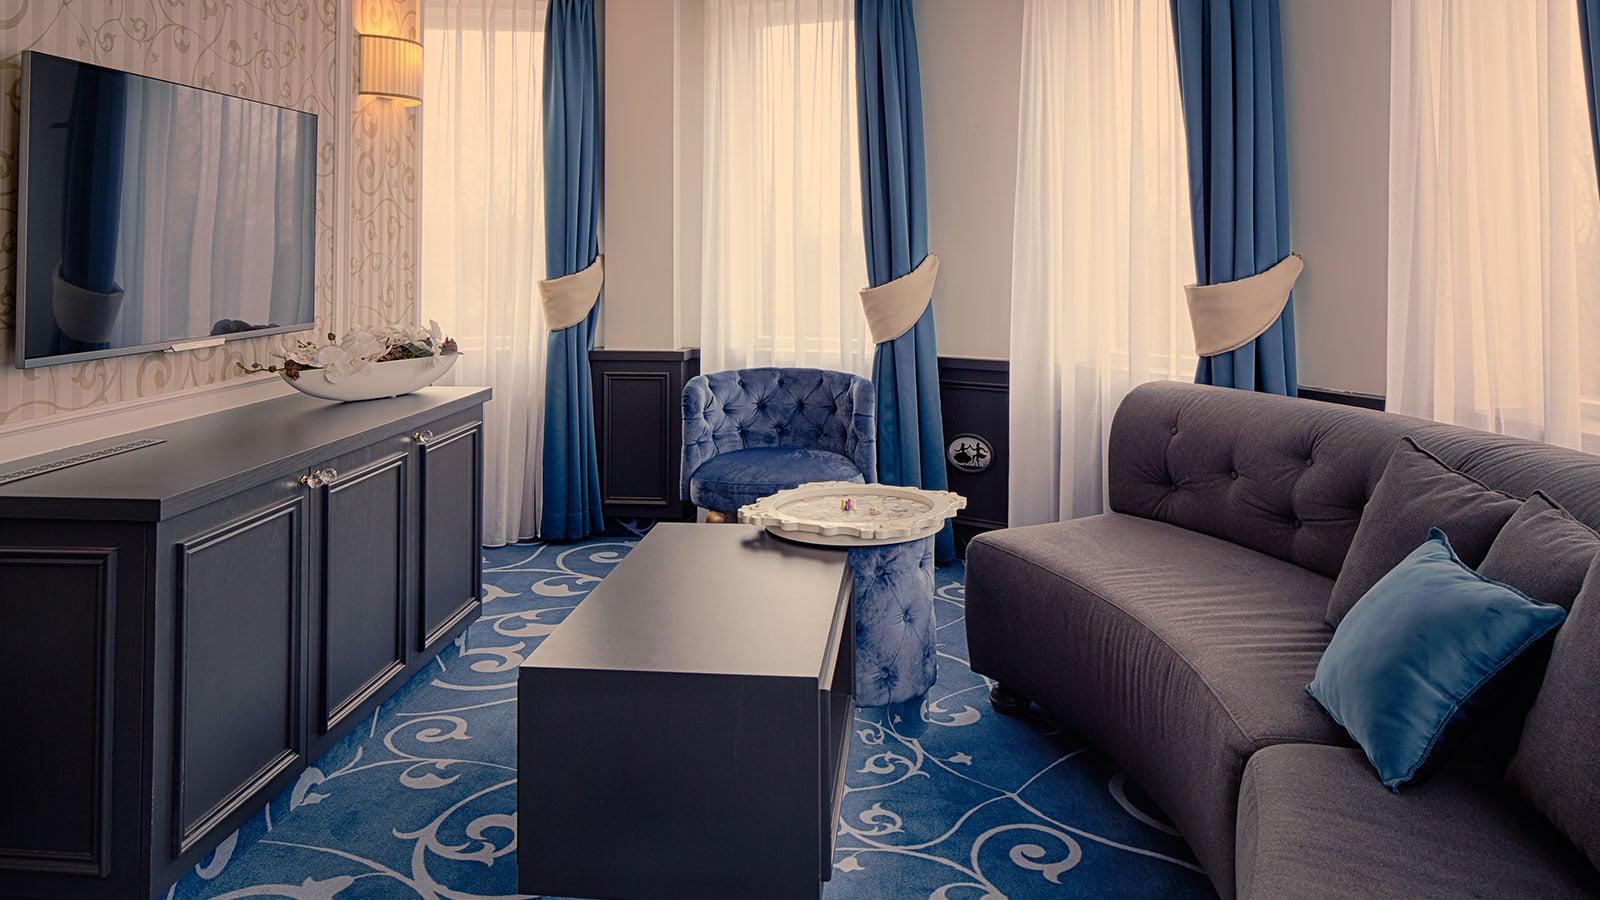 Junior Suite 5 Person Efteling Hotel